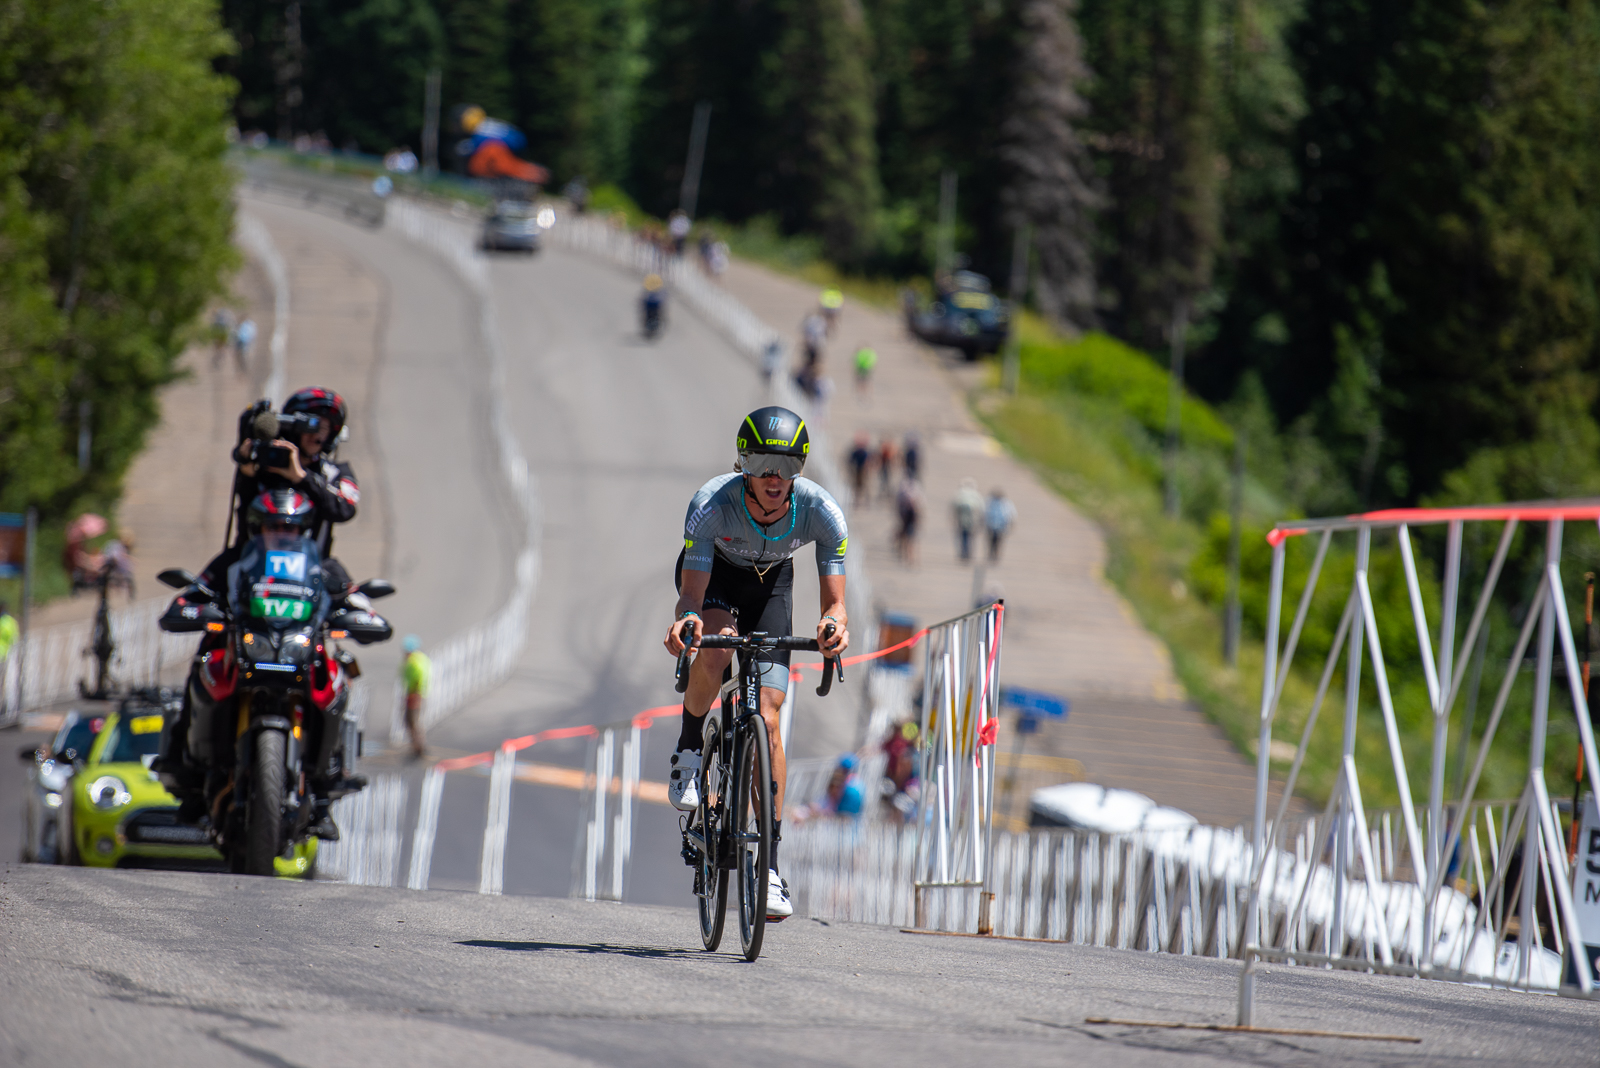 TJ Eisenhart (Arapahoe-Hincapie p/b BMC) starts his Prologue time trial. 2019 Tour of Utah. Photo by Steven L. Sheffield